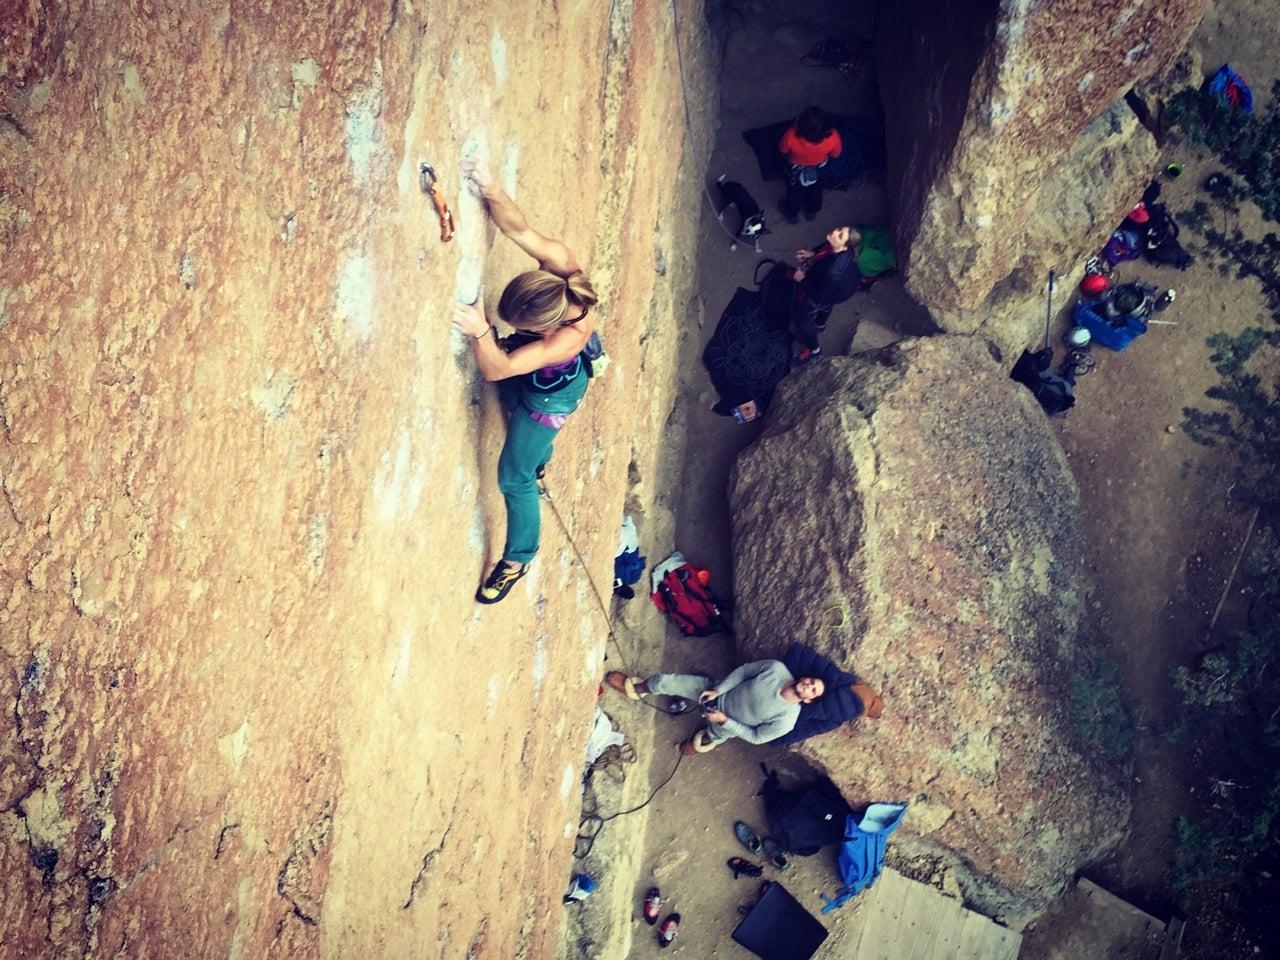 Cragging At Smith Rock